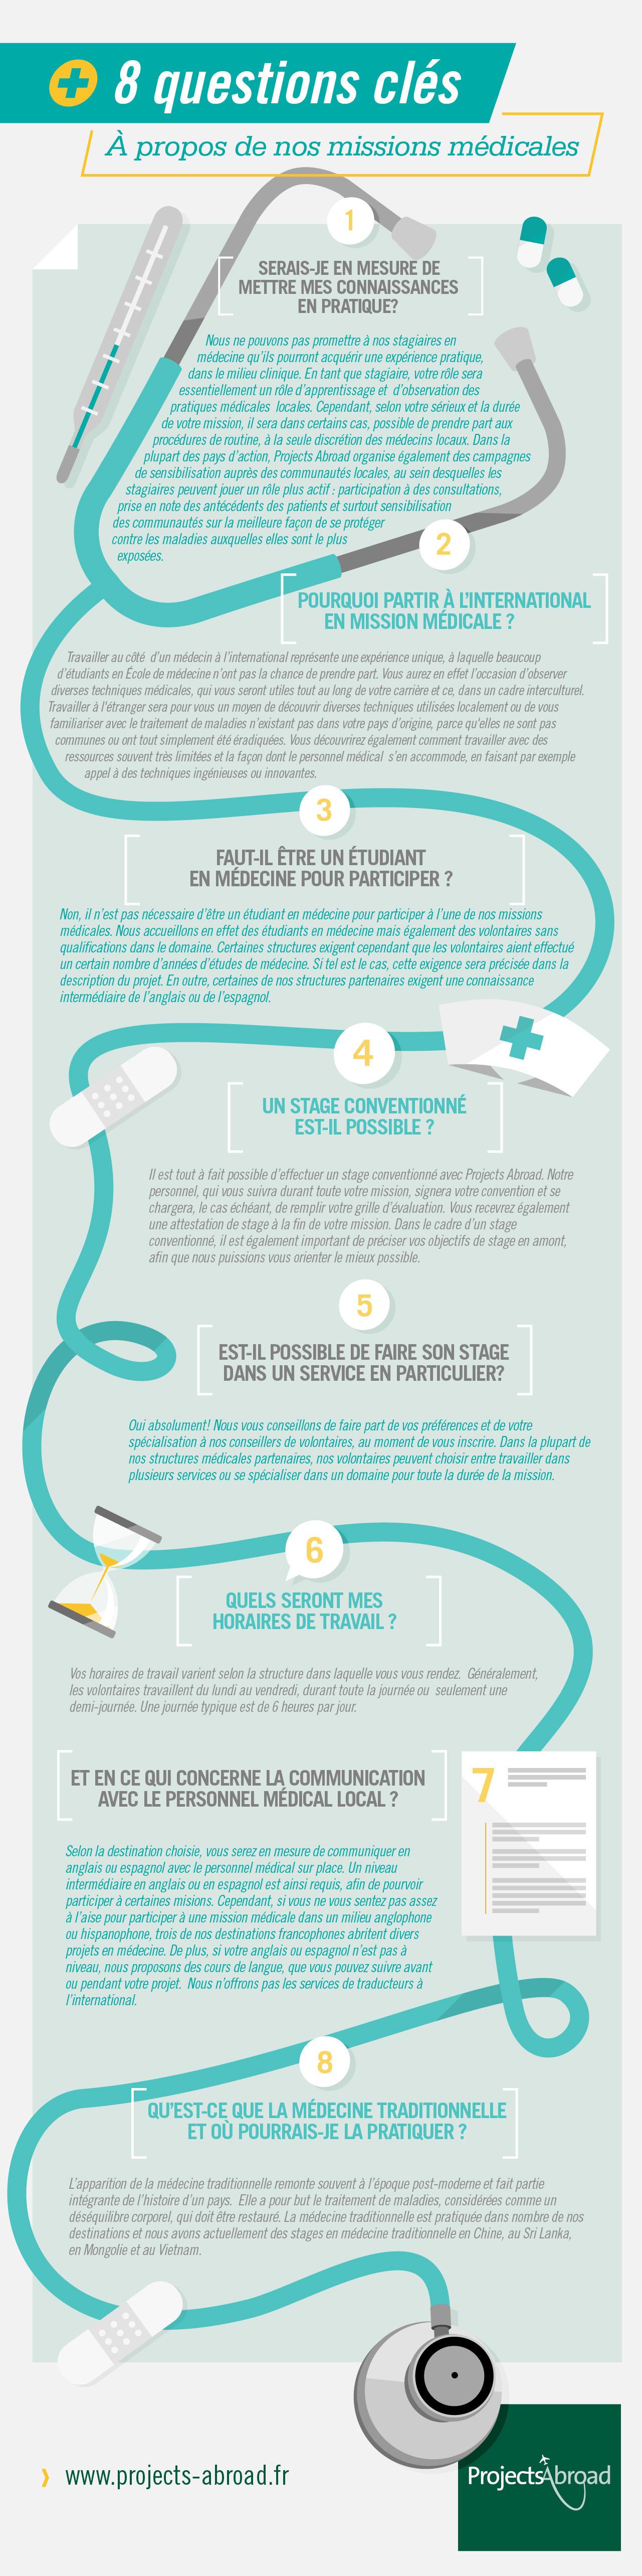 Volontariat Et Stage En Medecine Generale A L Etranger Projects Abroad